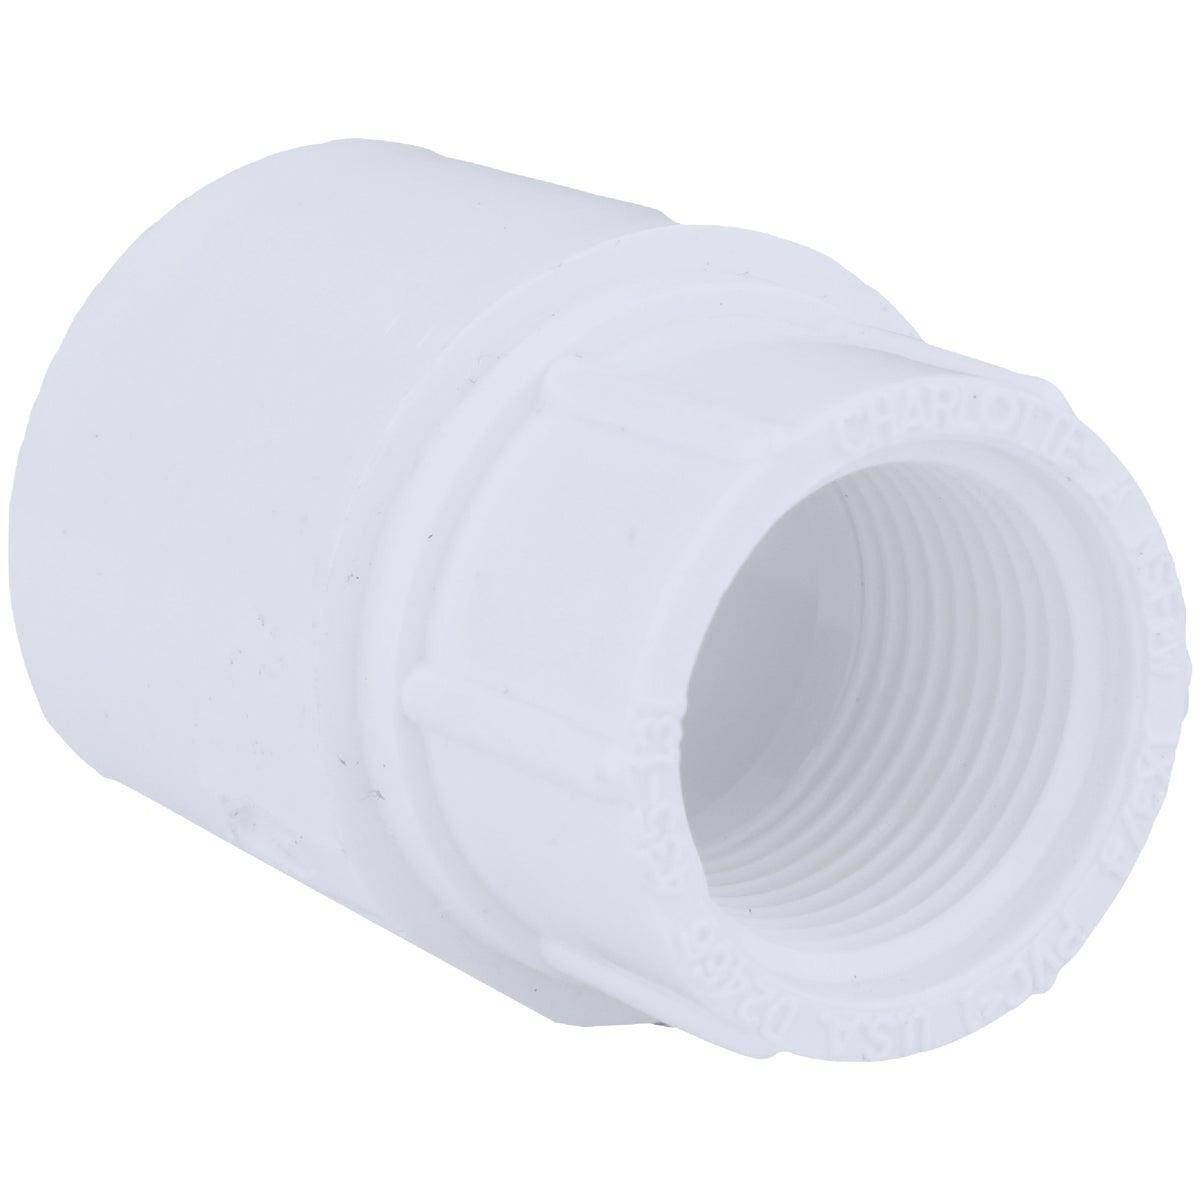 1X3/4 PVC SXFIP ADAPTER